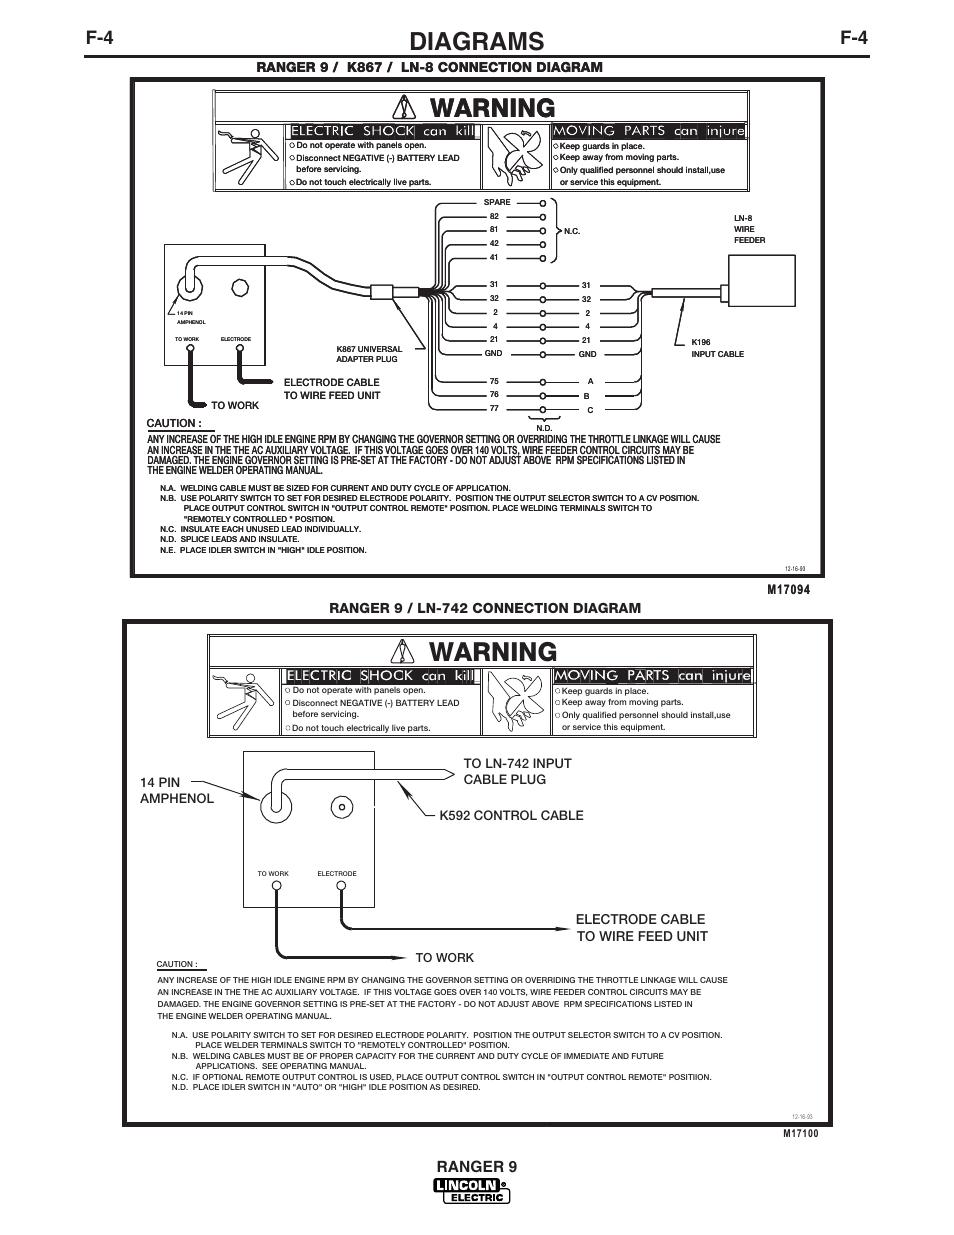 Diagrams, Warning, Ranger 9 | Lincoln Electric IM753 RANGER 9 User Manual |  Page 36 / 44Manuals Directory